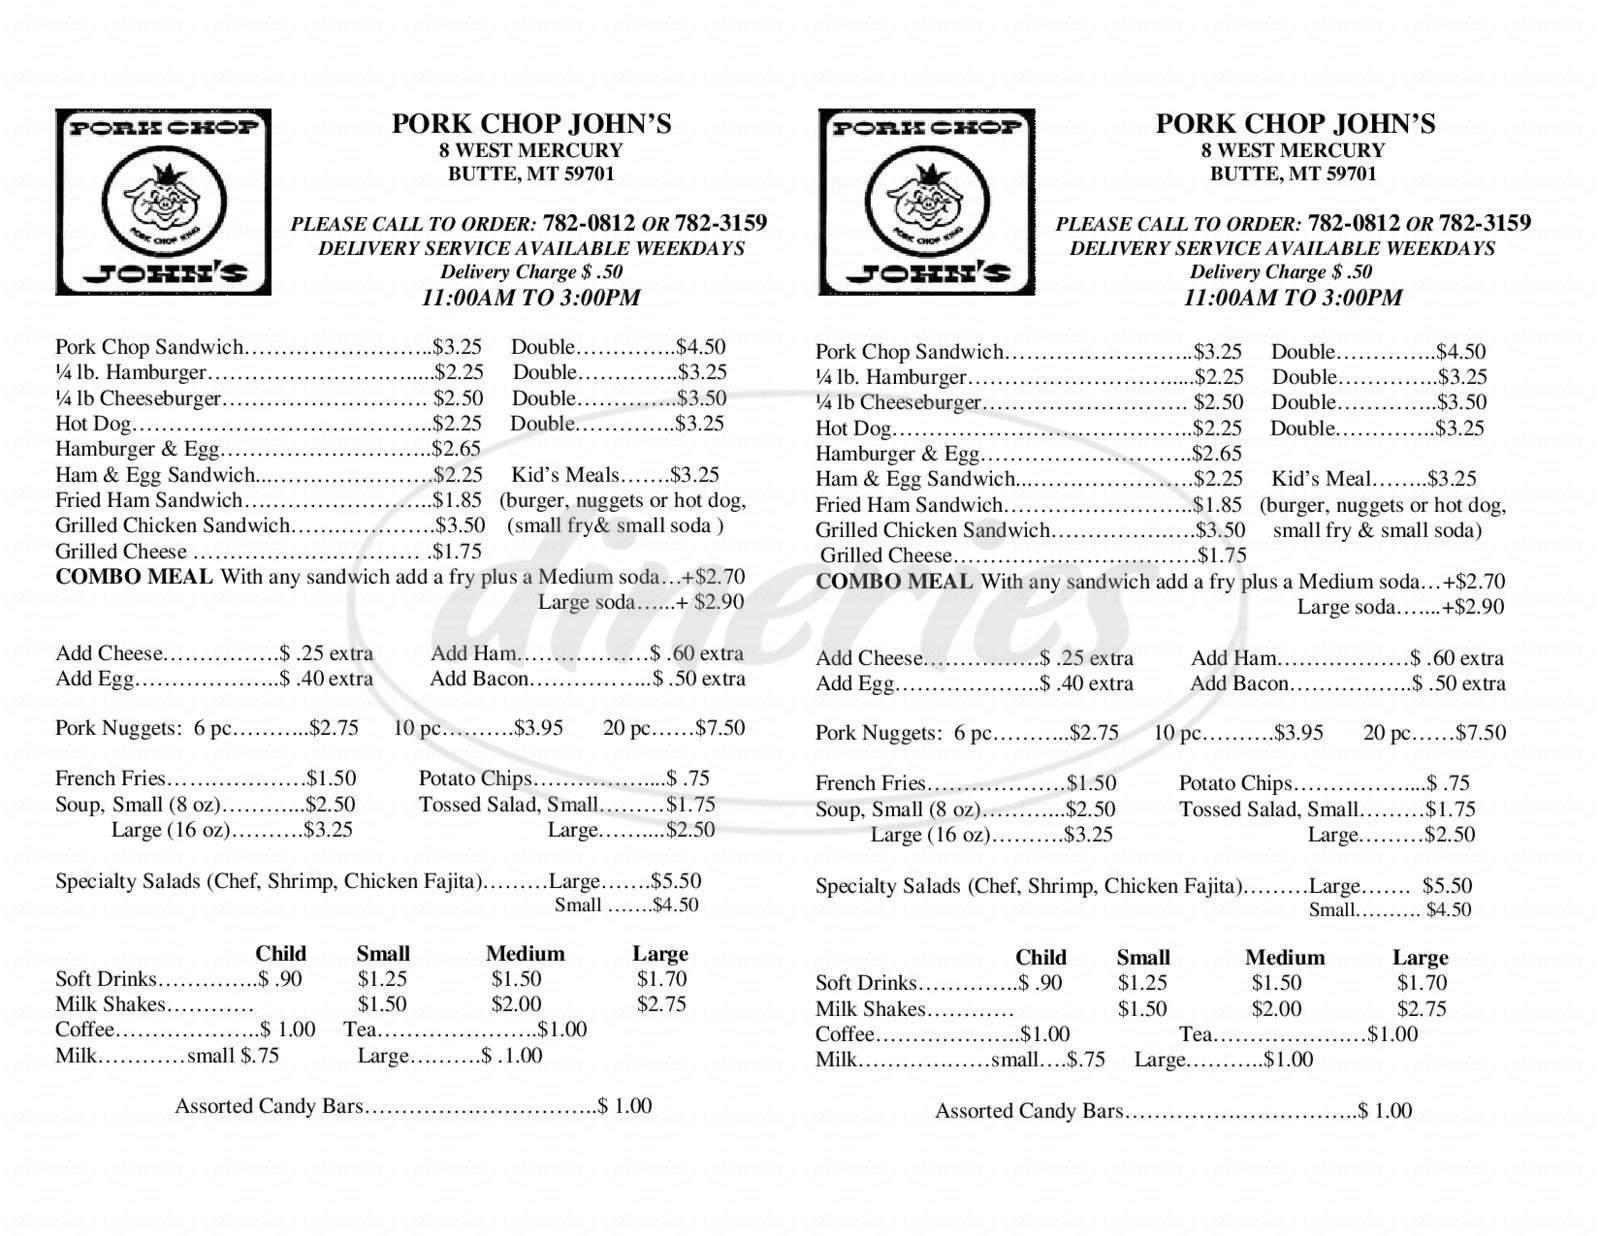 menu for Pork Chop John's